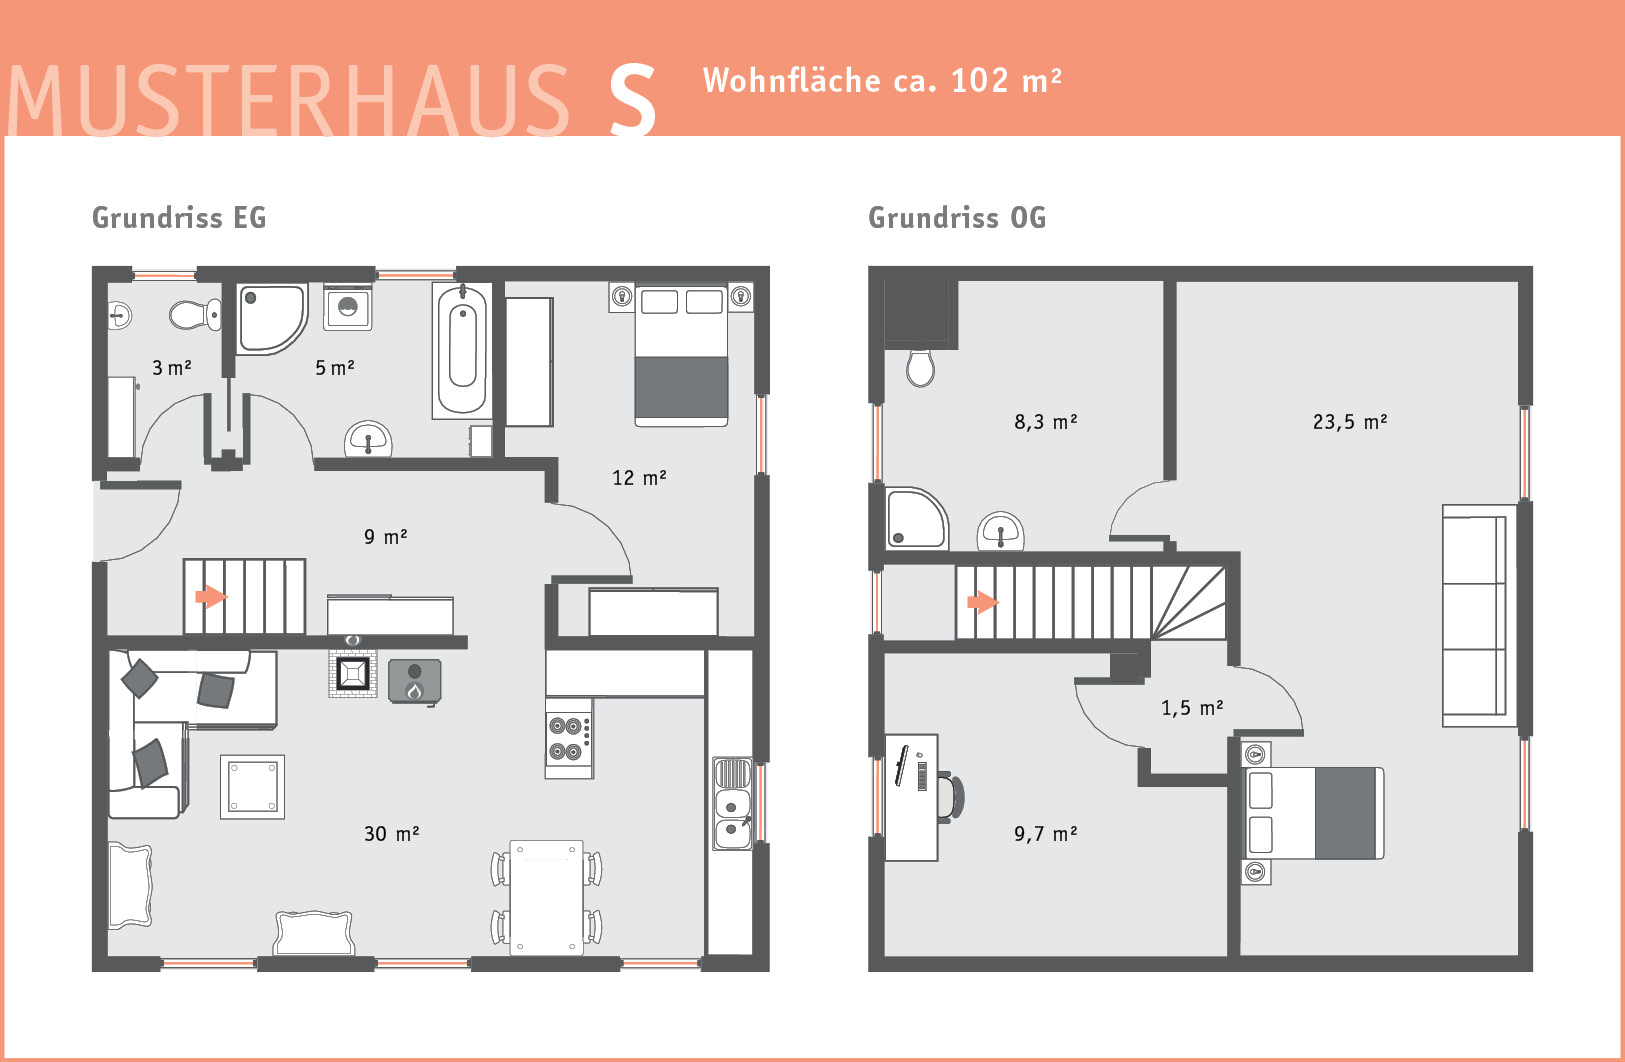 Brunthaler Holzhaus Musterhaus S Bauplan